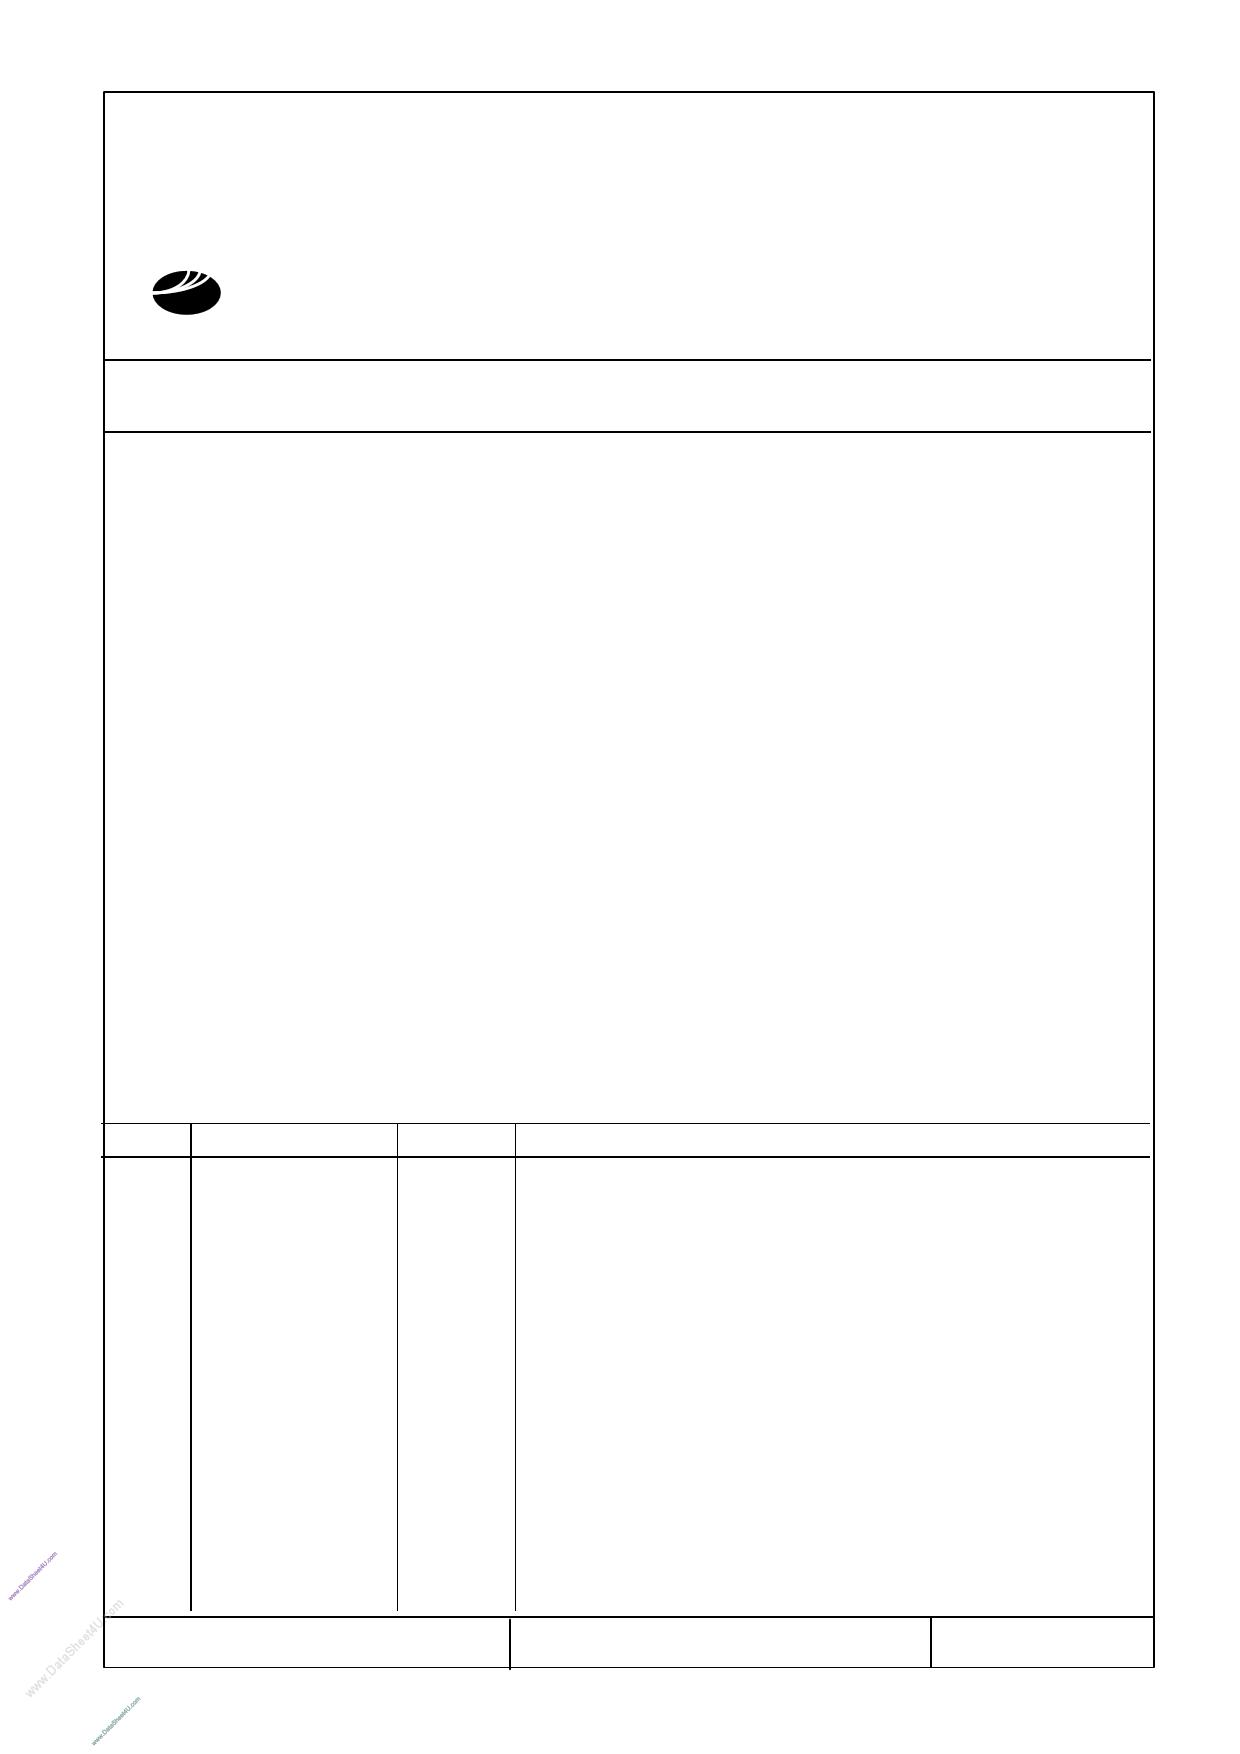 T-51515D104J-FW_A_AA دیتاشیت PDF